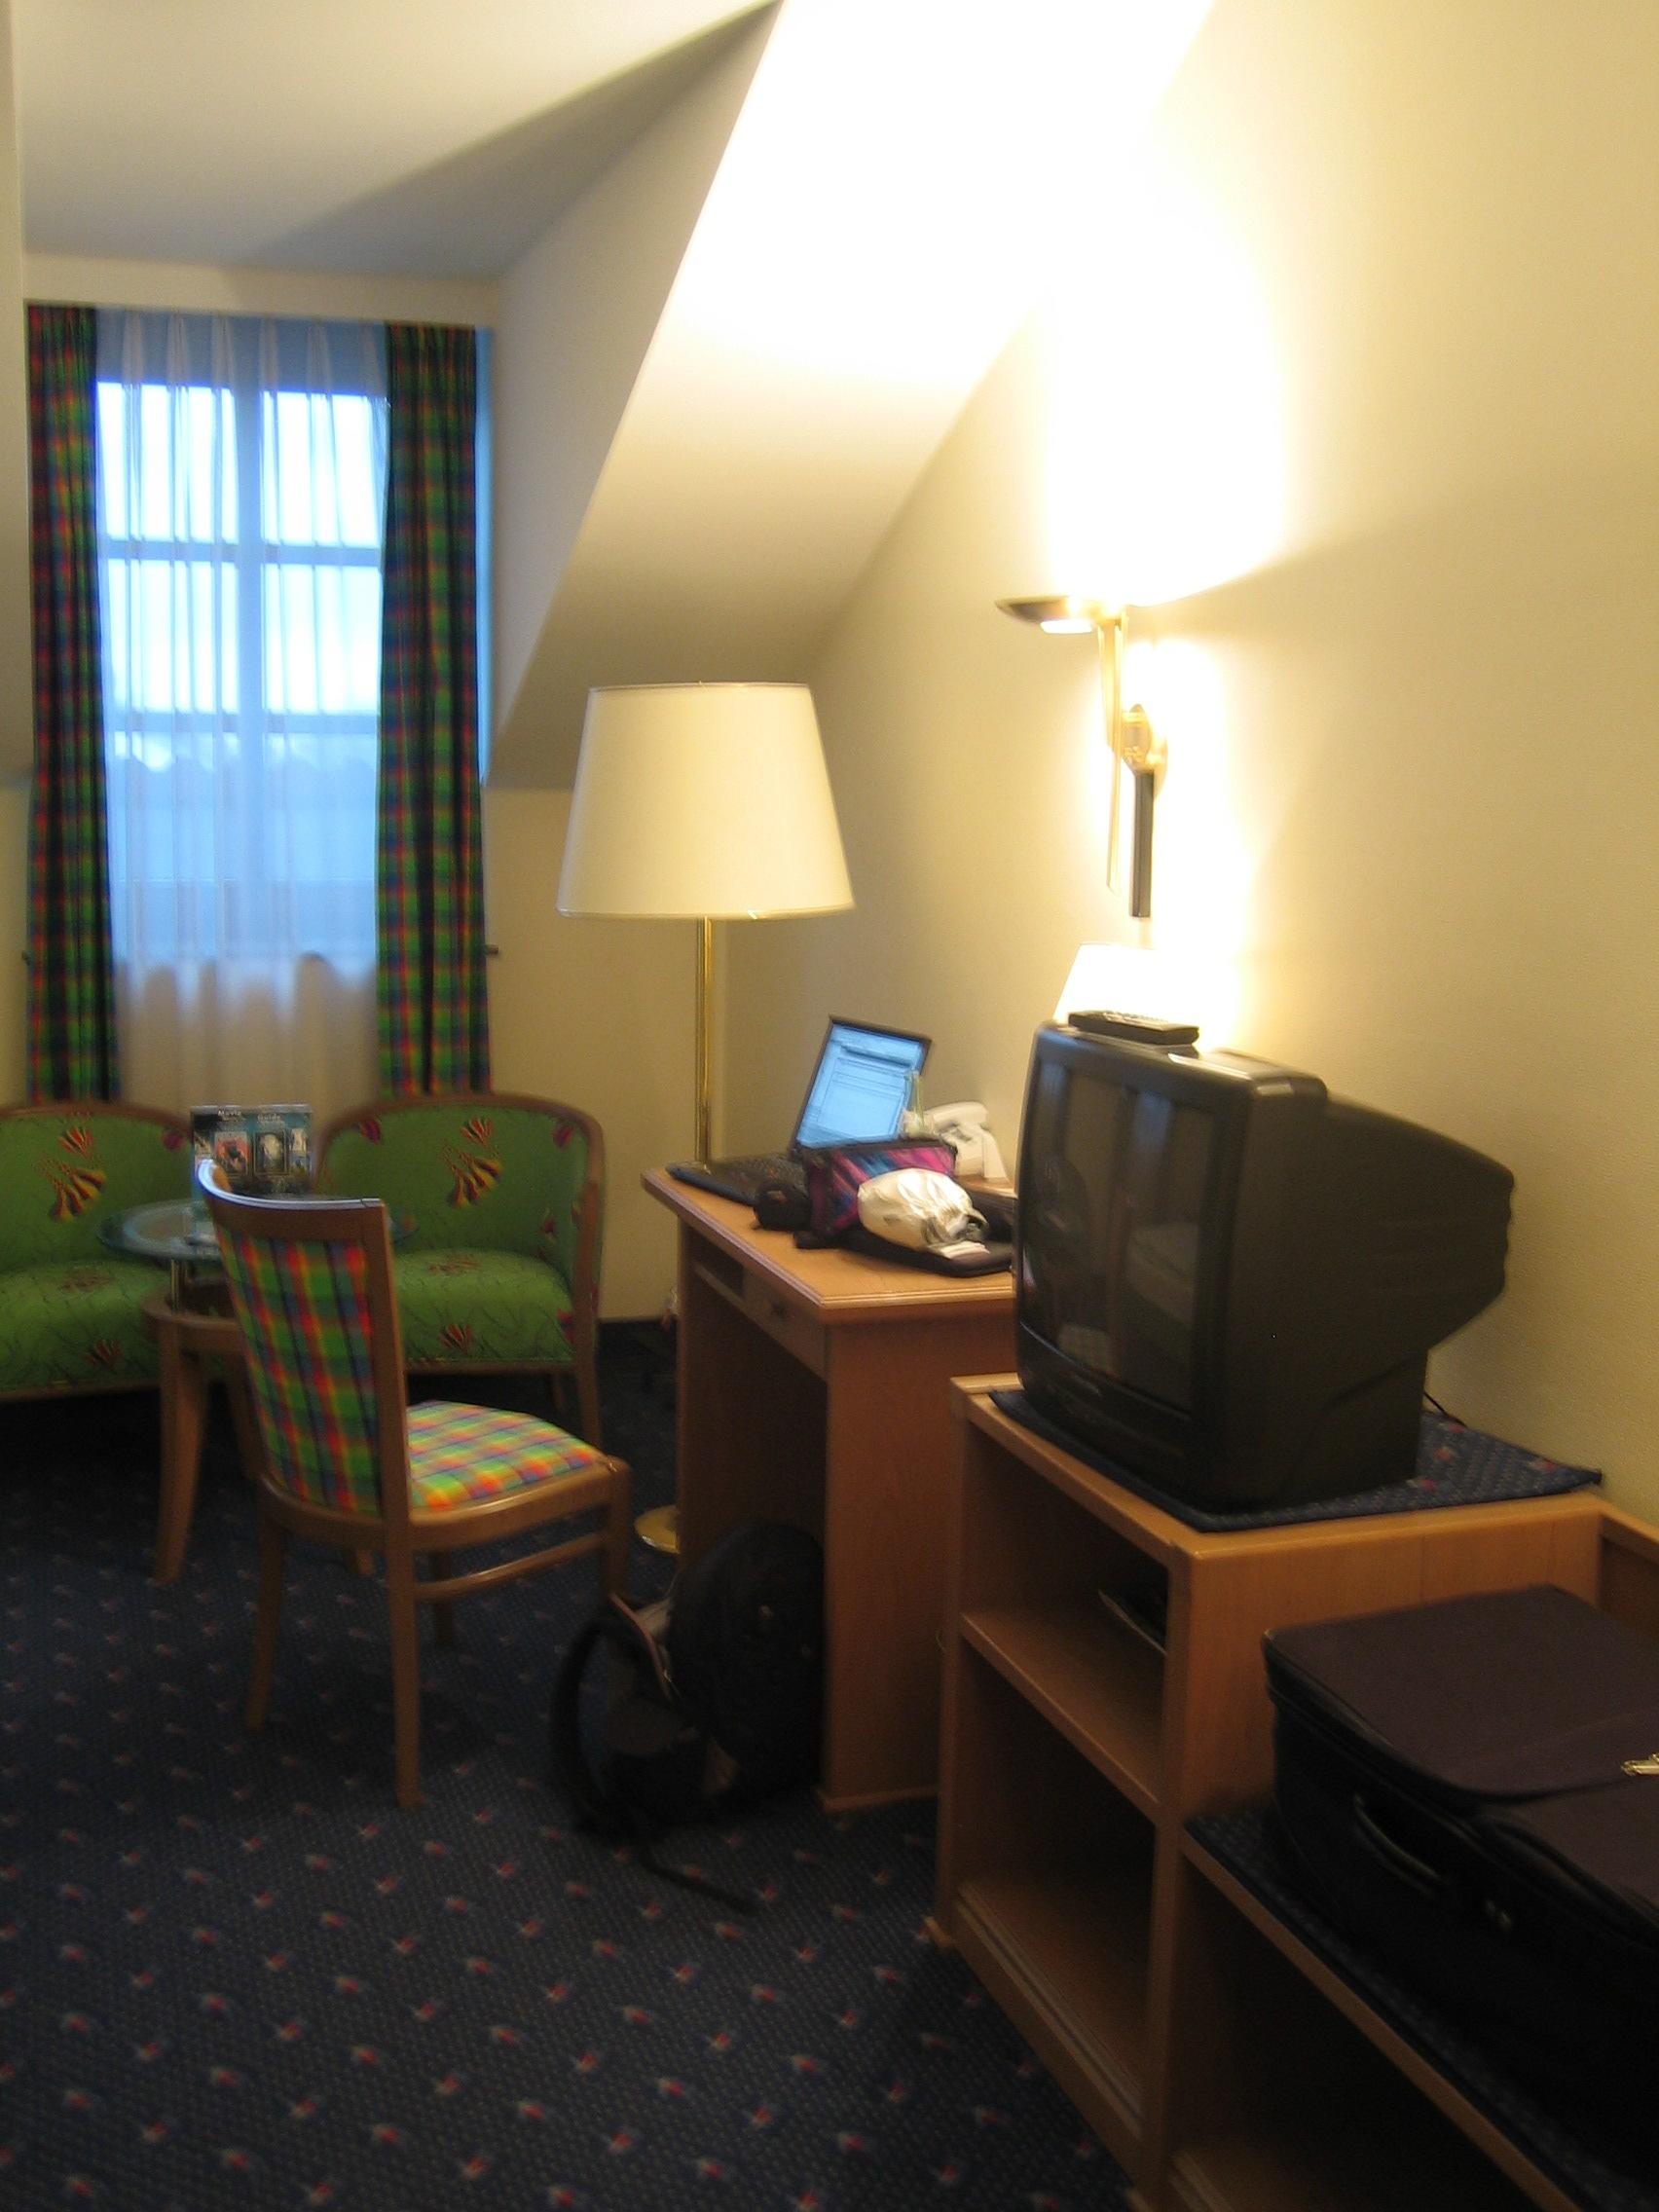 Feldkirchen Munchen Hotel